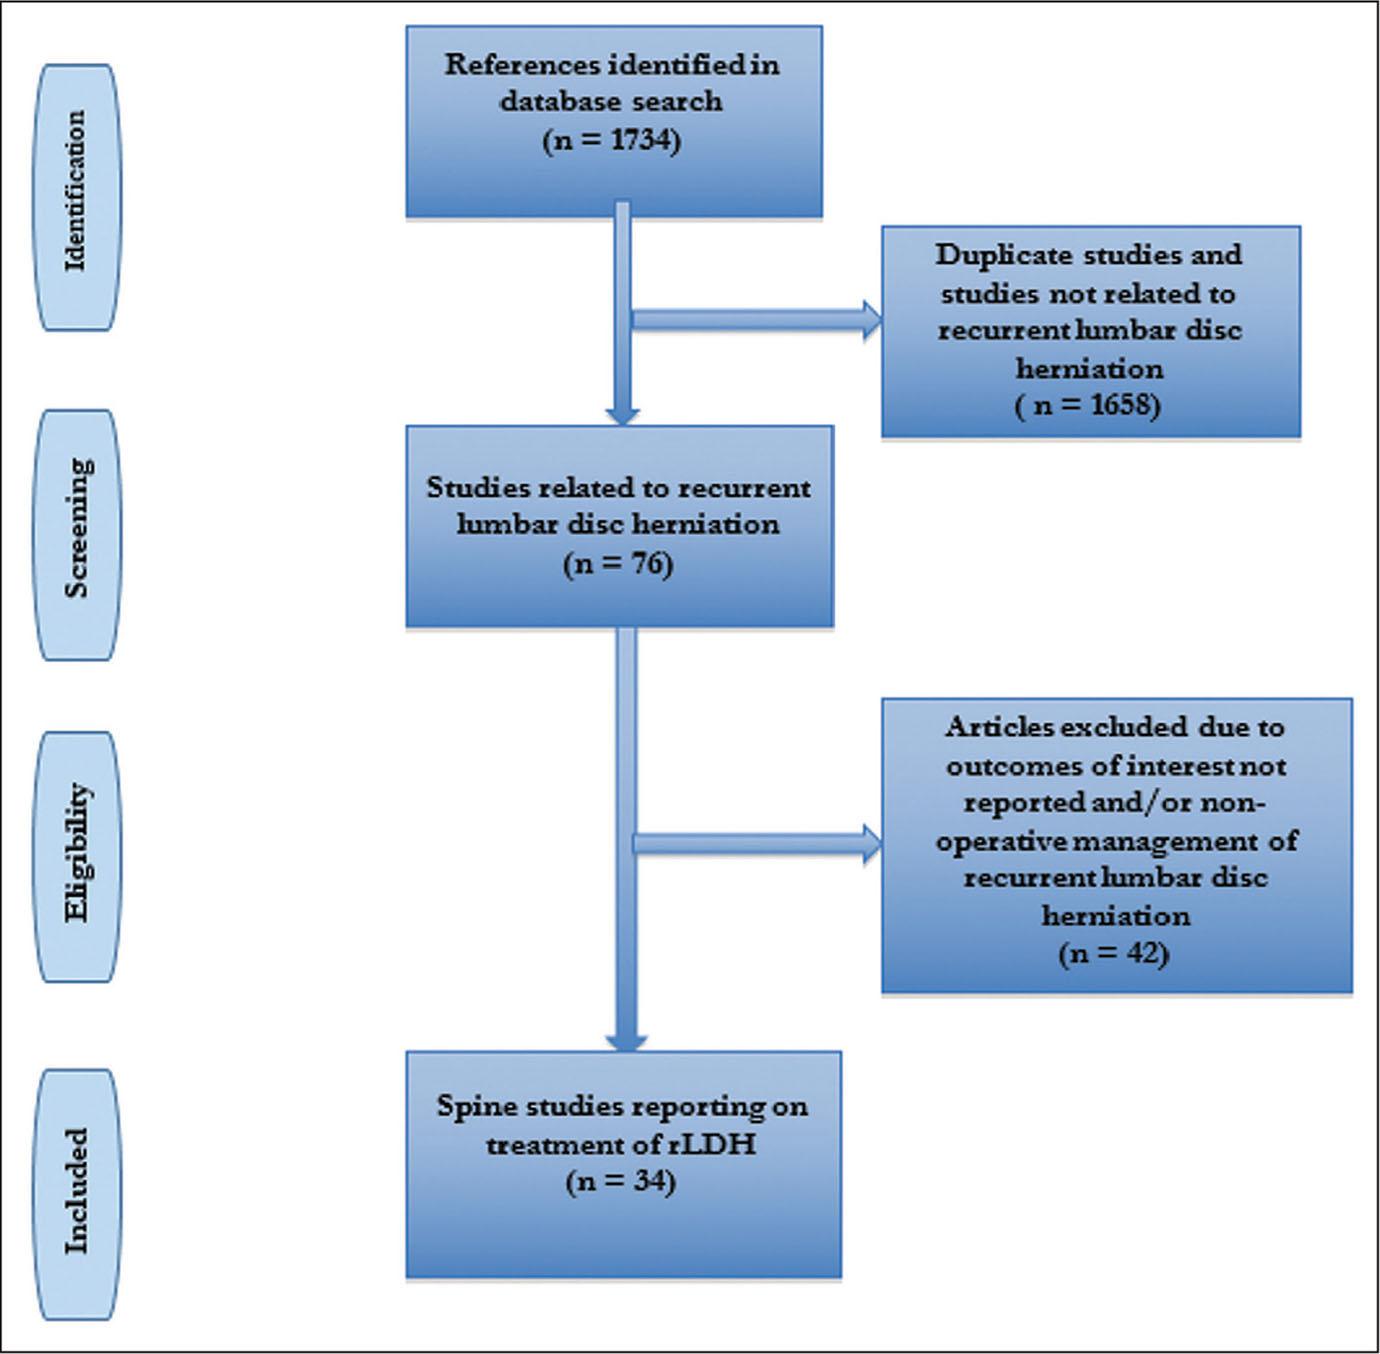 Flowchart of included studies. Abbreviation: rLDH, recurrent lumbar disk herniation.